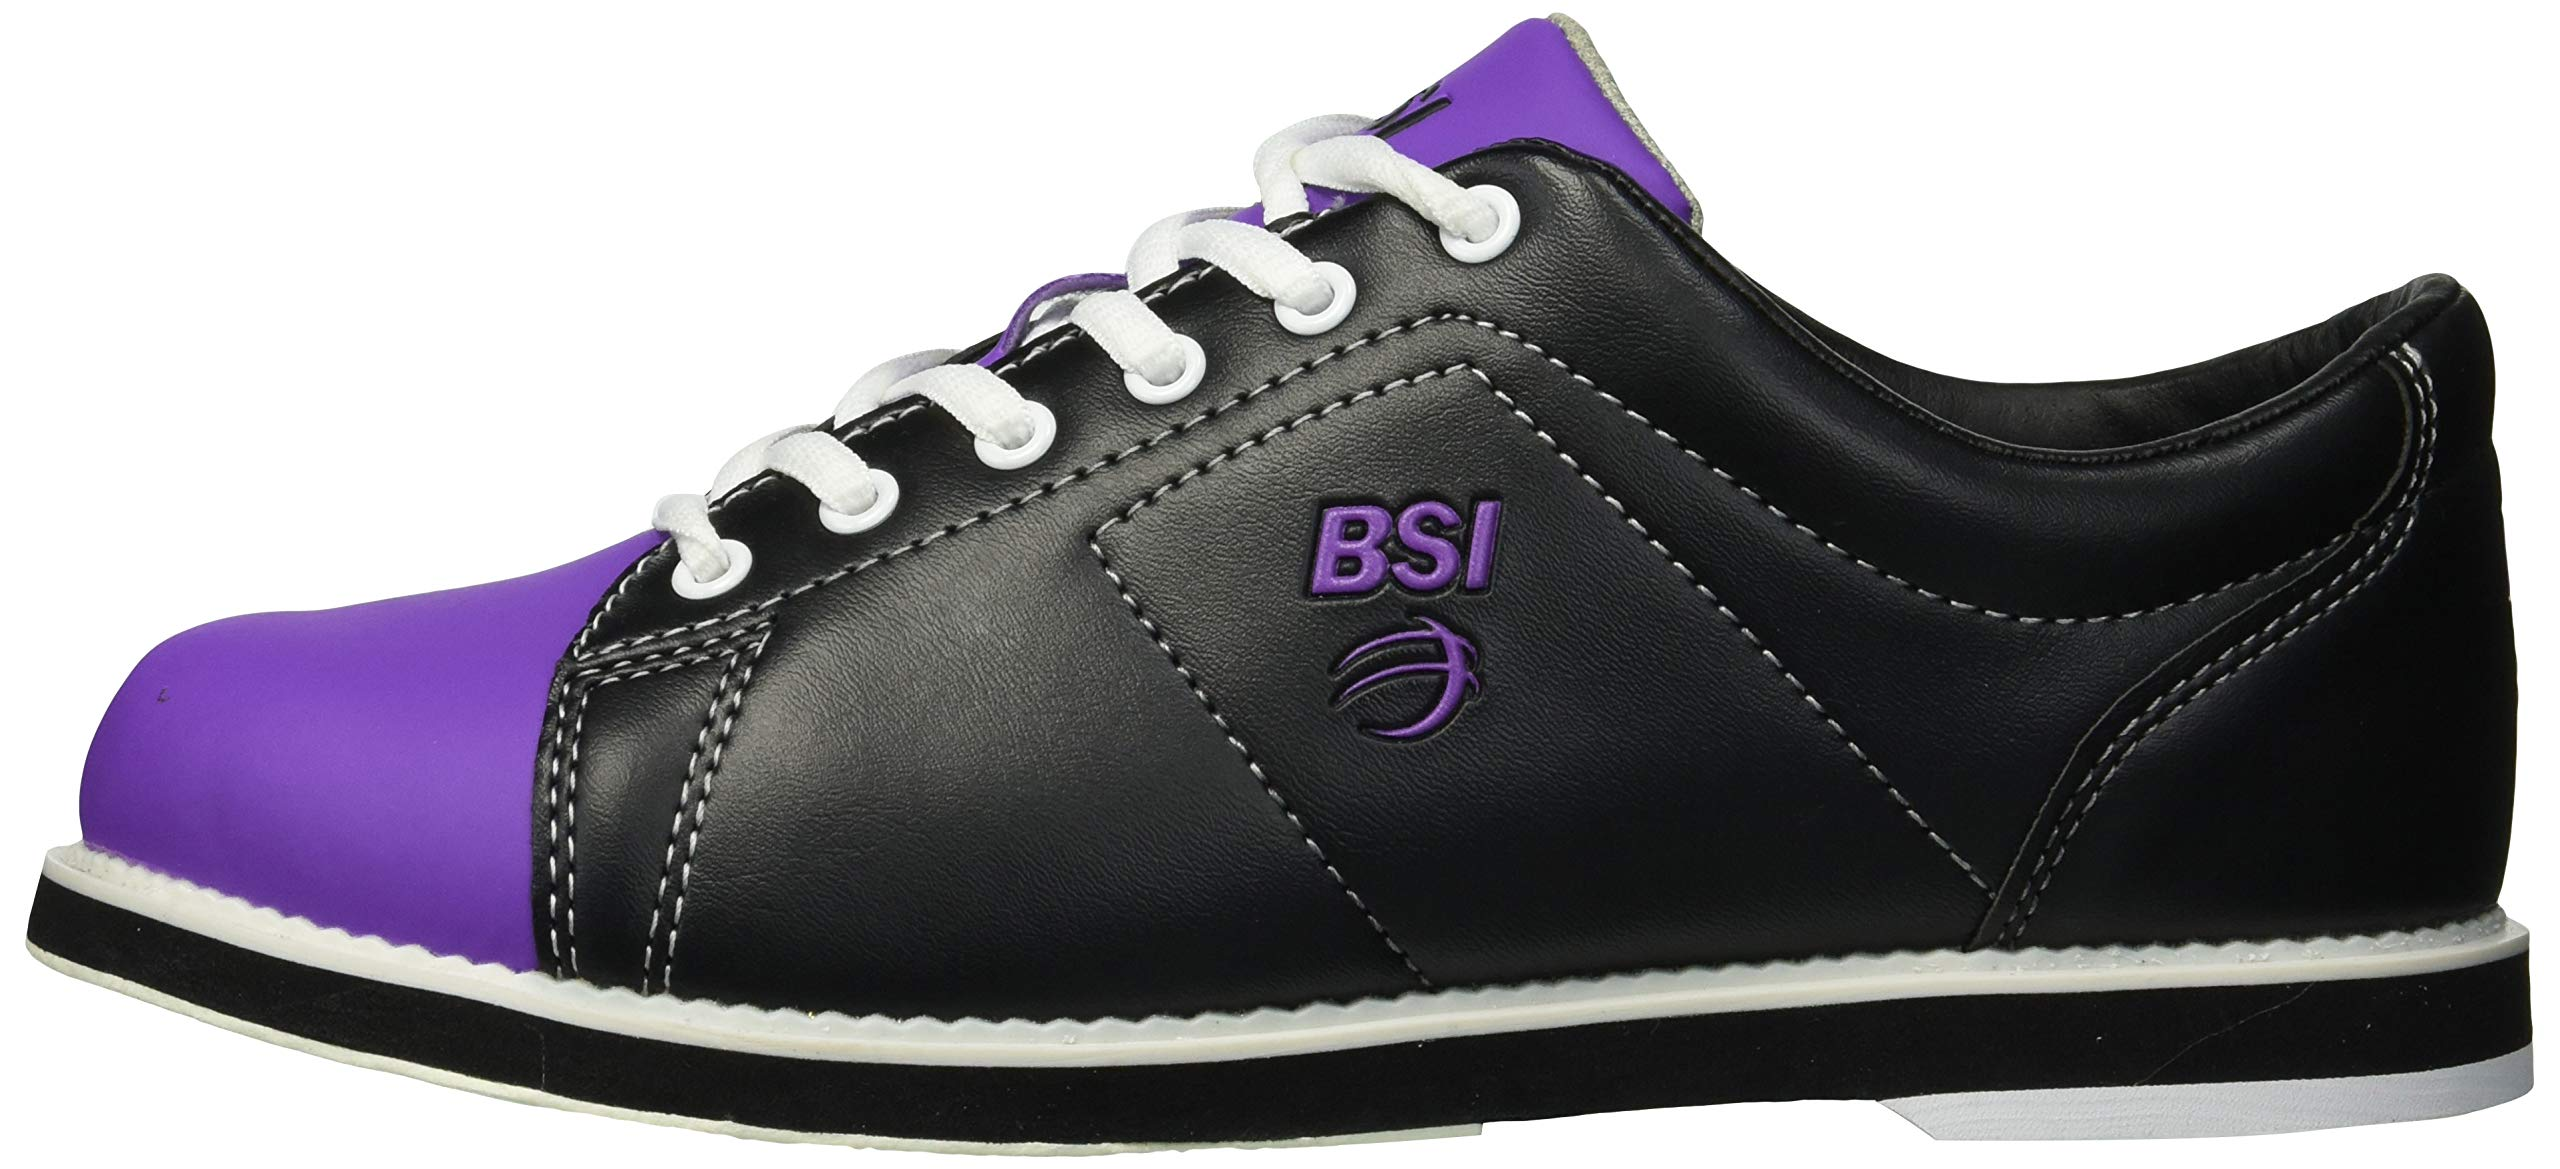 BSI 654 Women's Classic #654, Black/Purple, 7.0 by BSI (Image #5)